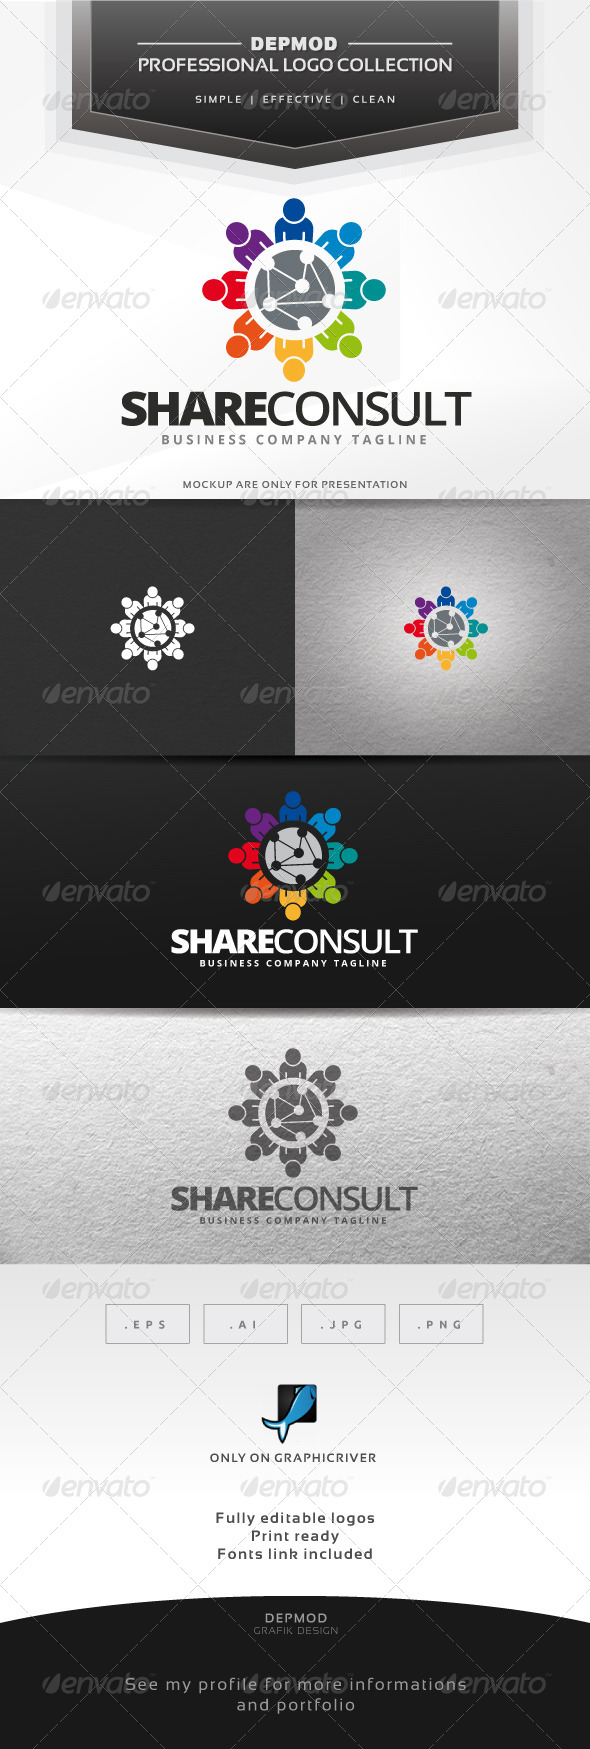 Share Consult Logo - Symbols Logo Templates